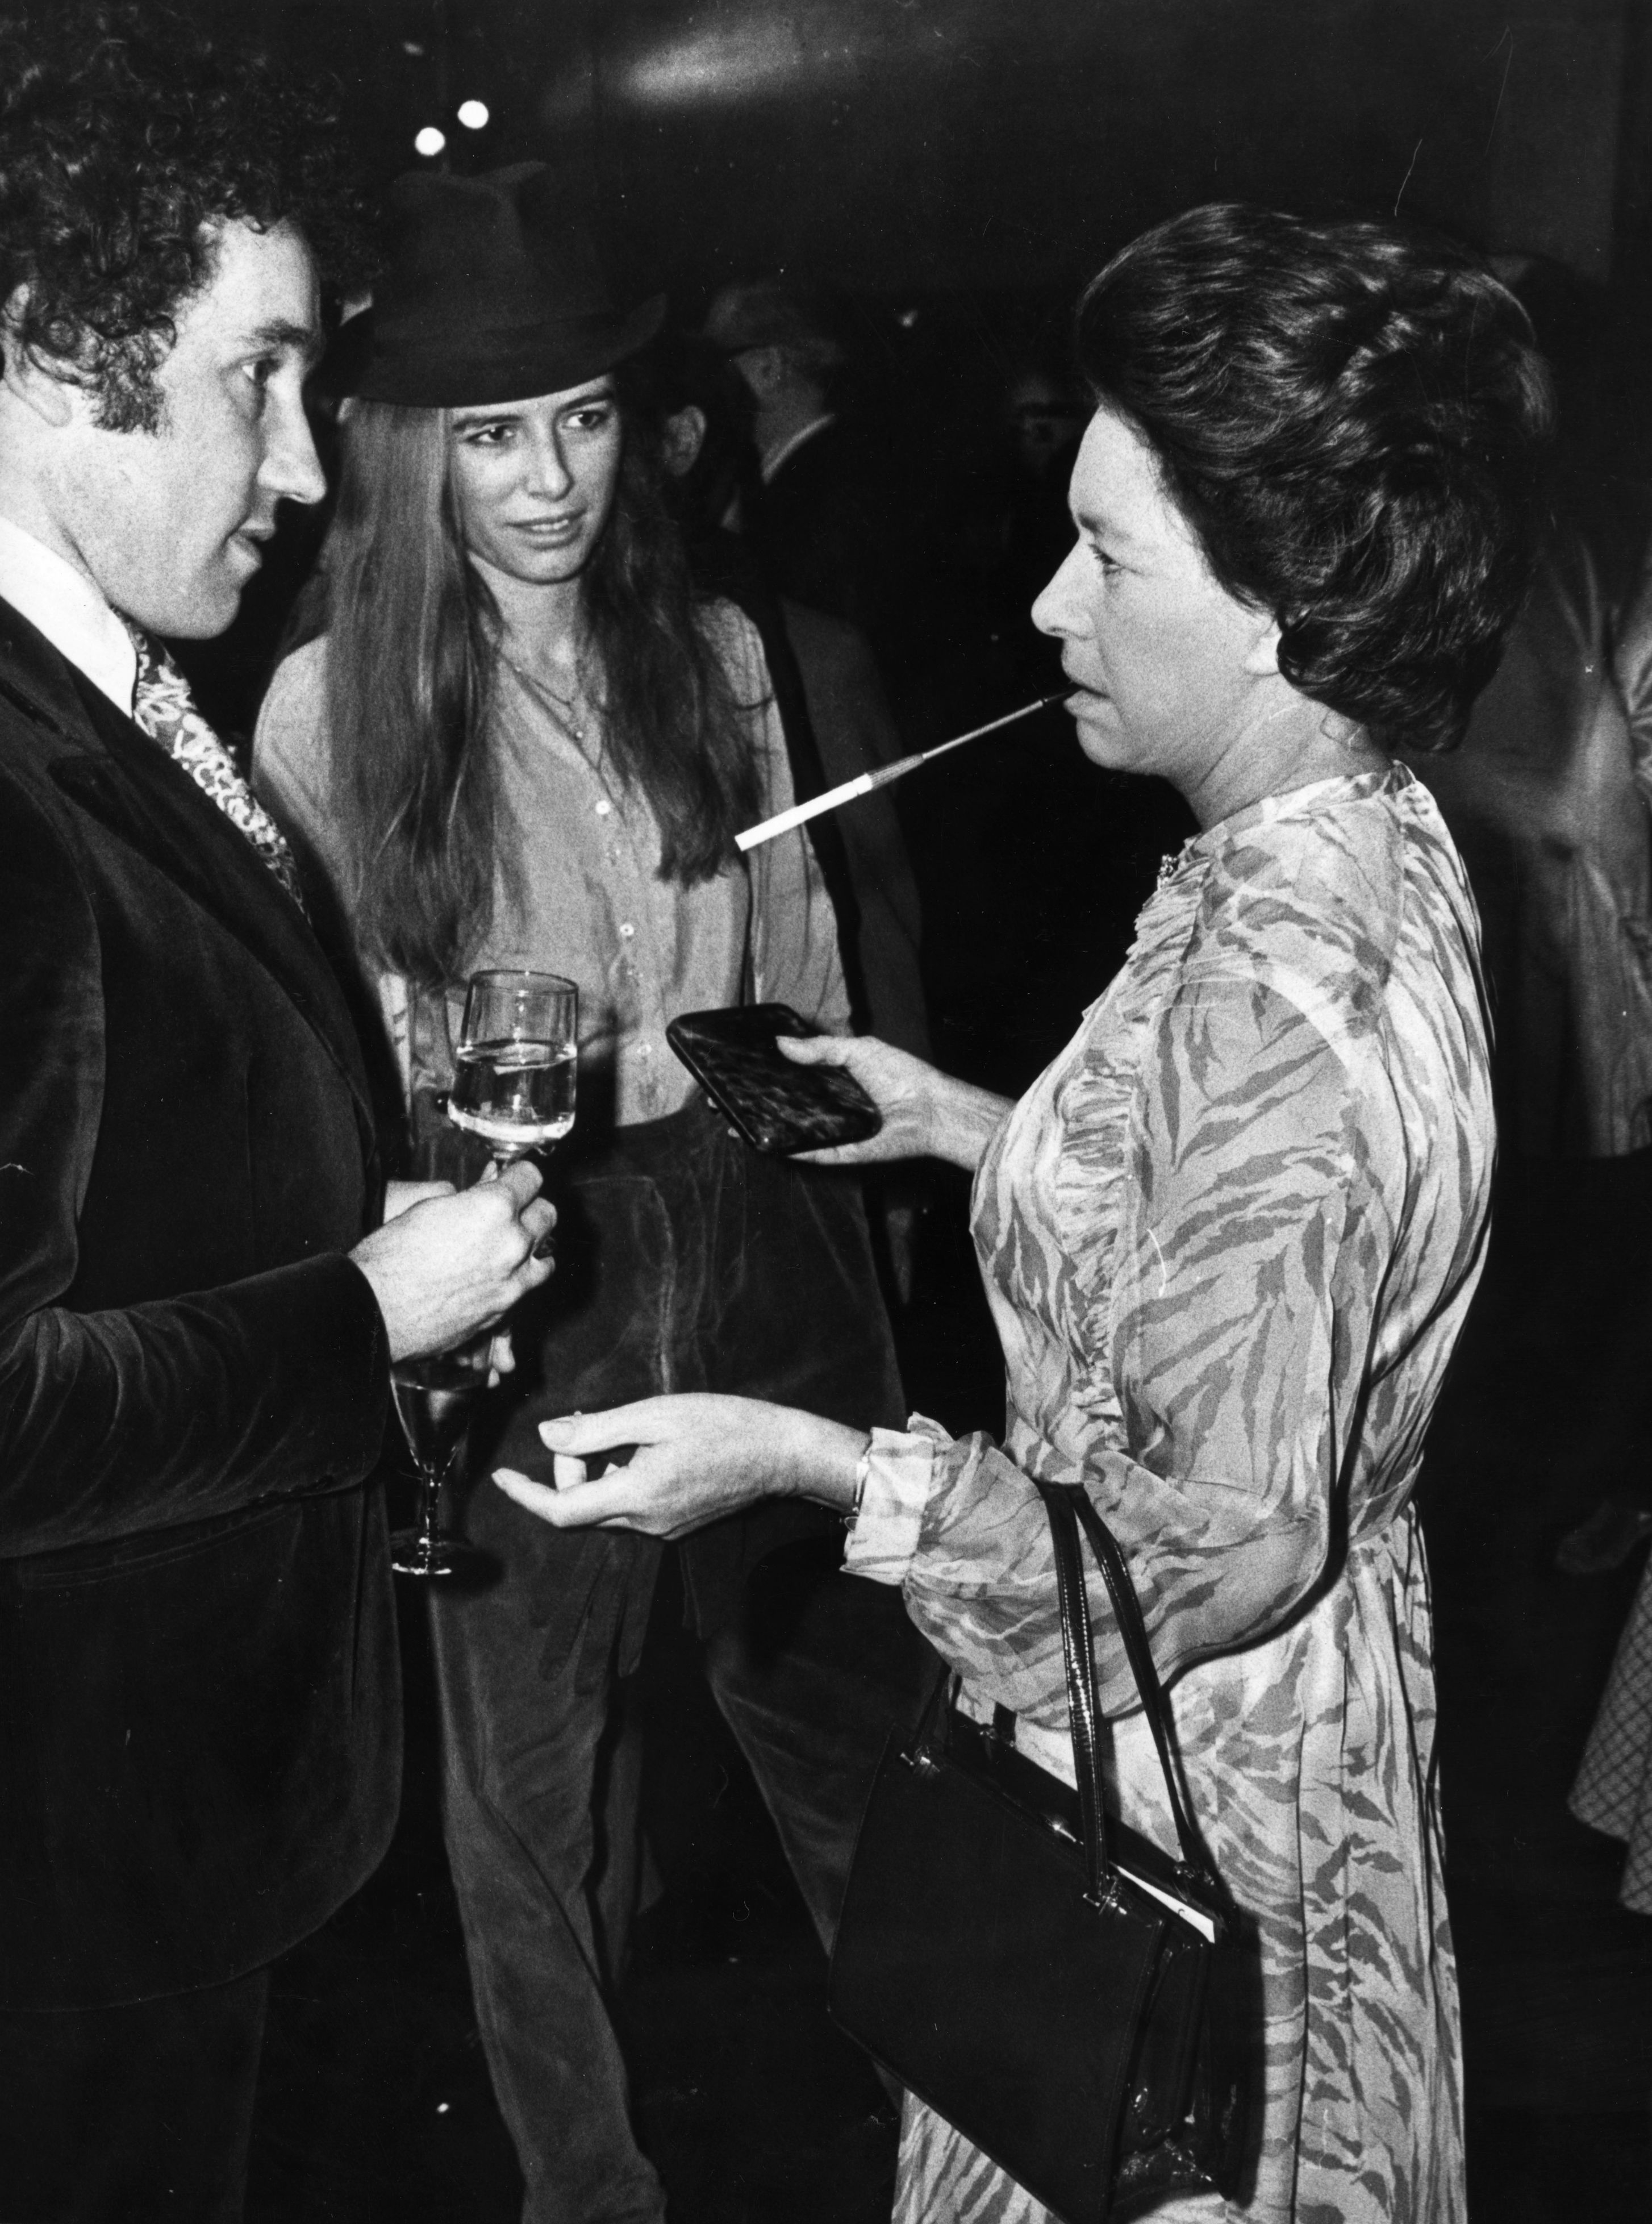 875ad93e679182 Vintage Photos of Celebrities Smoking - Vintage Celebrities Lighting Up